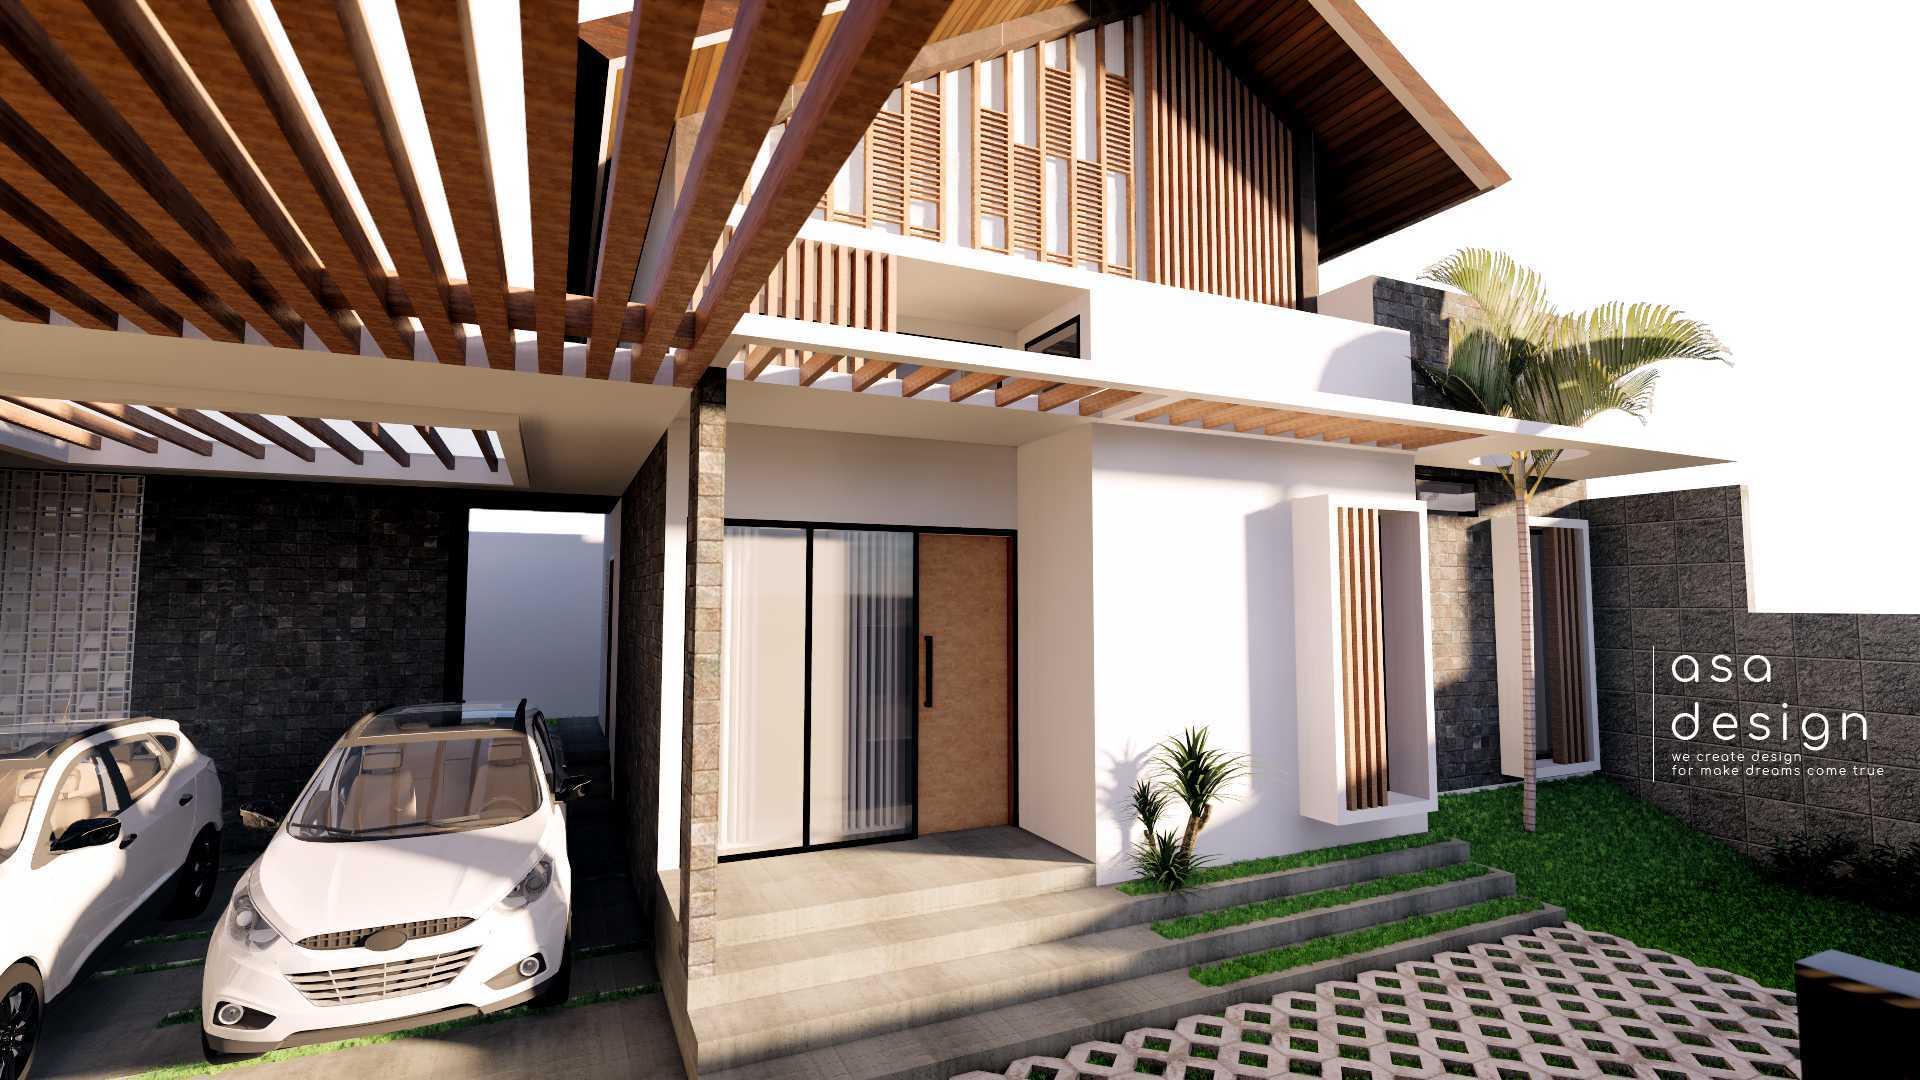 Asa Design Architect Griya Atap Miring Kediri, Jawa Timur, Indonesia Kediri, Jawa Timur, Indonesia Asa-Desain-Arsitek-Griya-Atap-Miring  125317